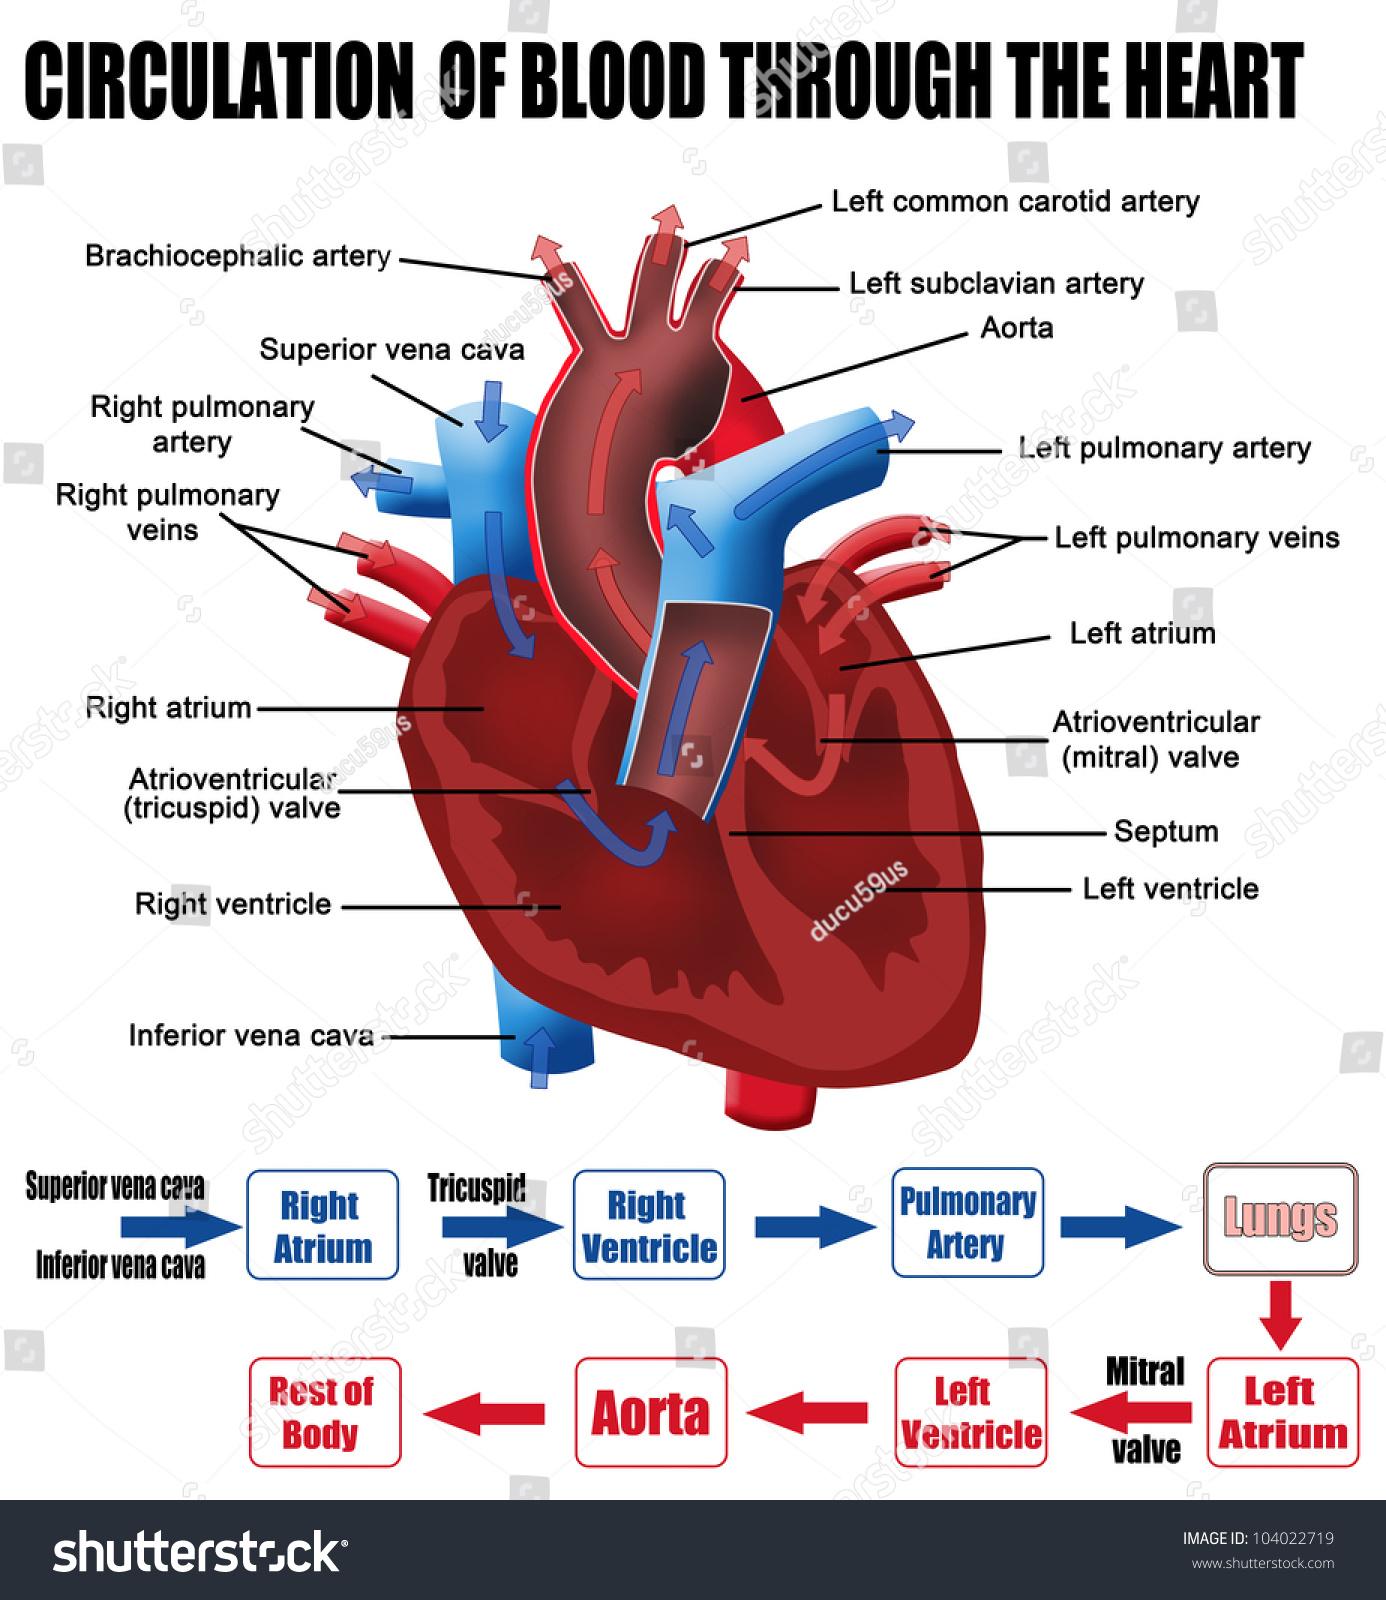 Circulation Blood Through Heart For Basic Stock Vector